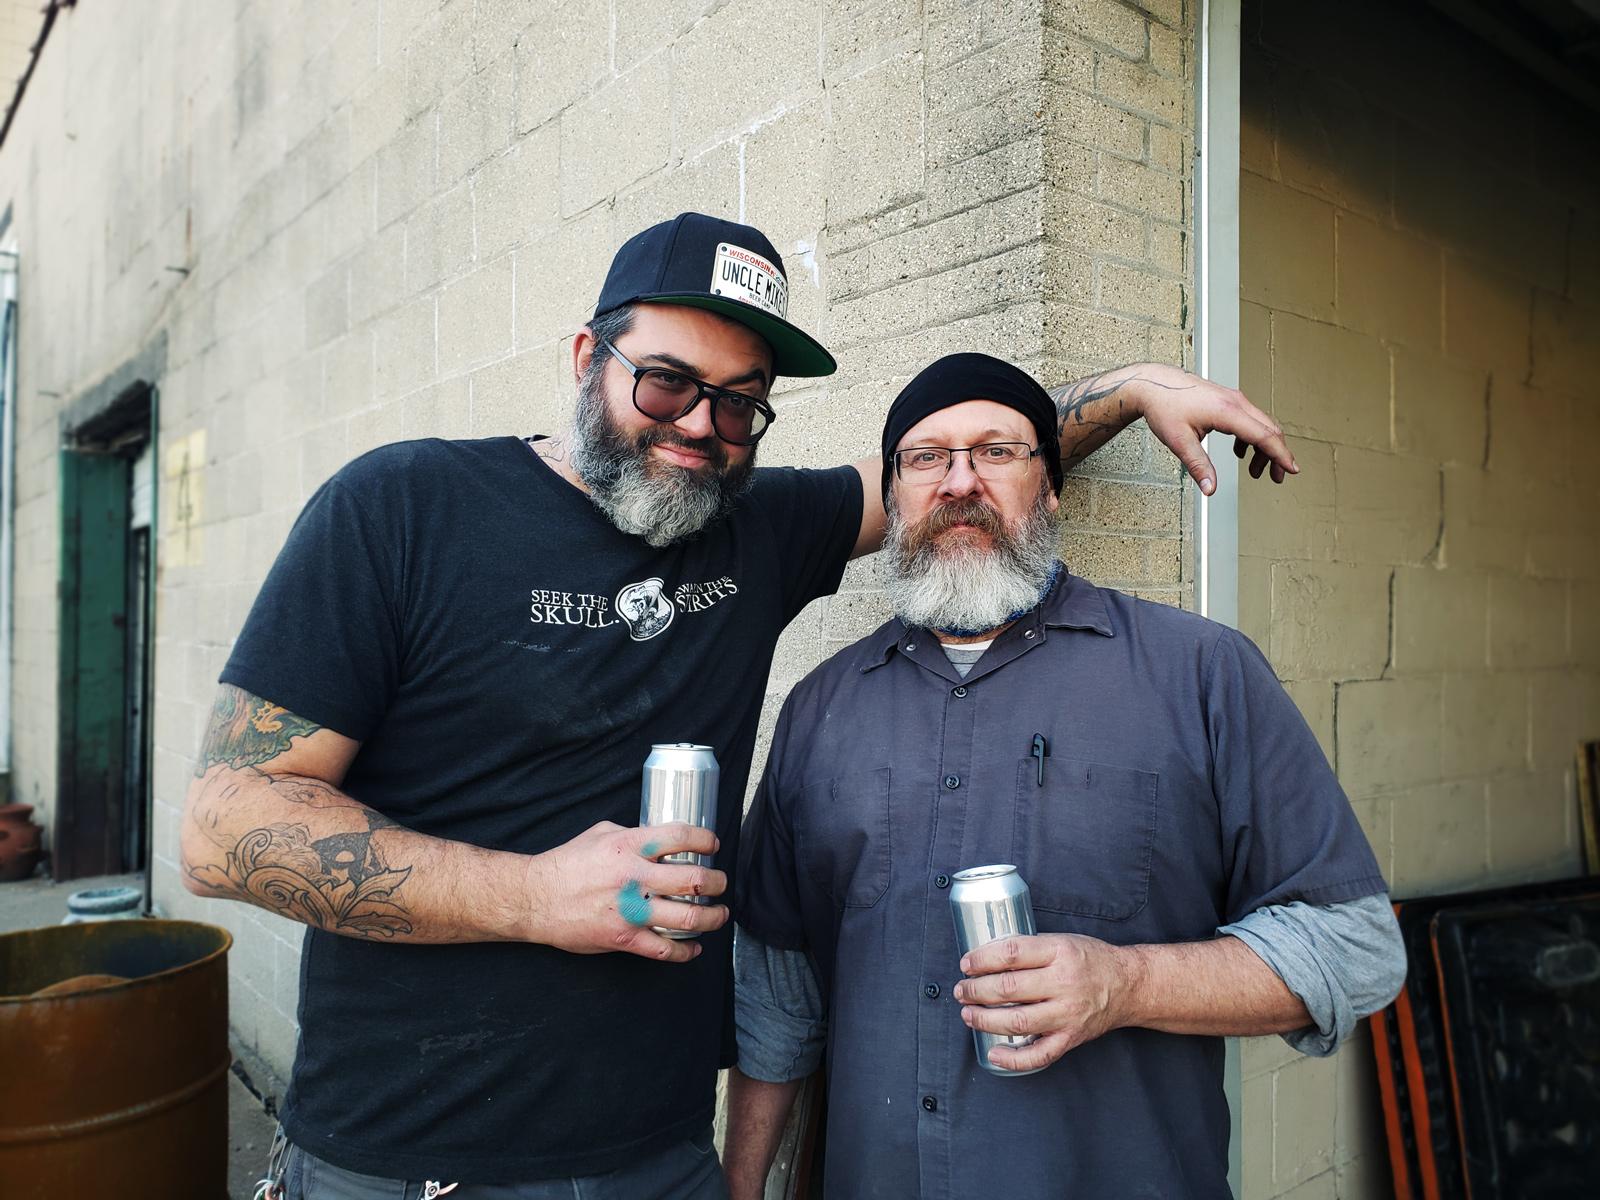 Brandon Minga and Tim Priebe